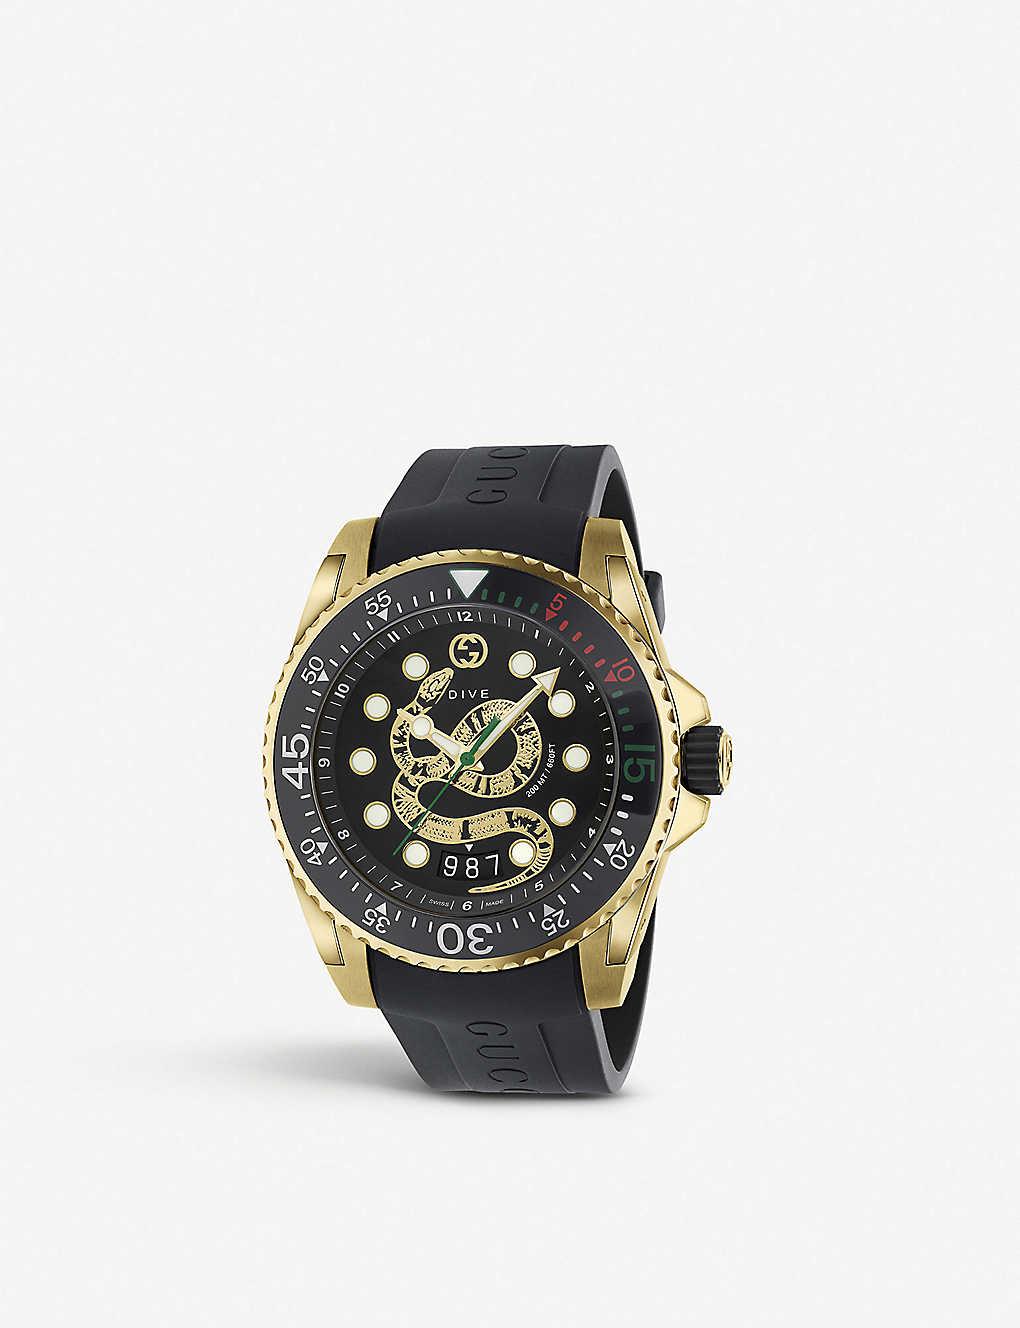 da88264d0 GUCCI - YA136219 Gucci Dive gold tone watch with snake design ...